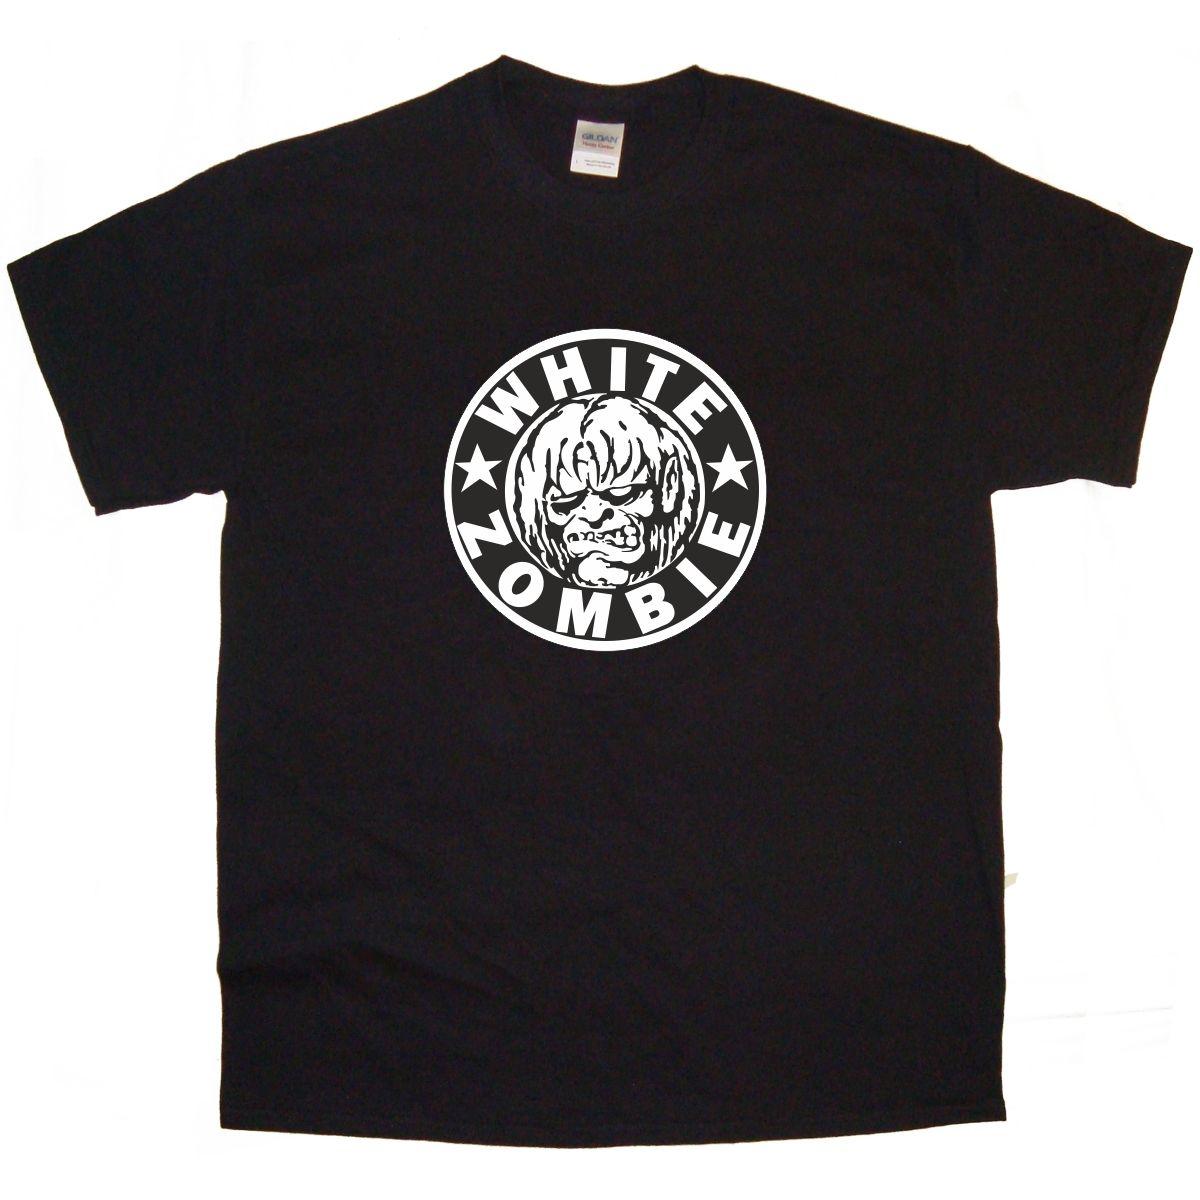 WHITE ZOMBIE Band logo Rock Thrash Black DEATH HEAVY METAL PUNK POP t shirt tee t cloth(China (Mainland))